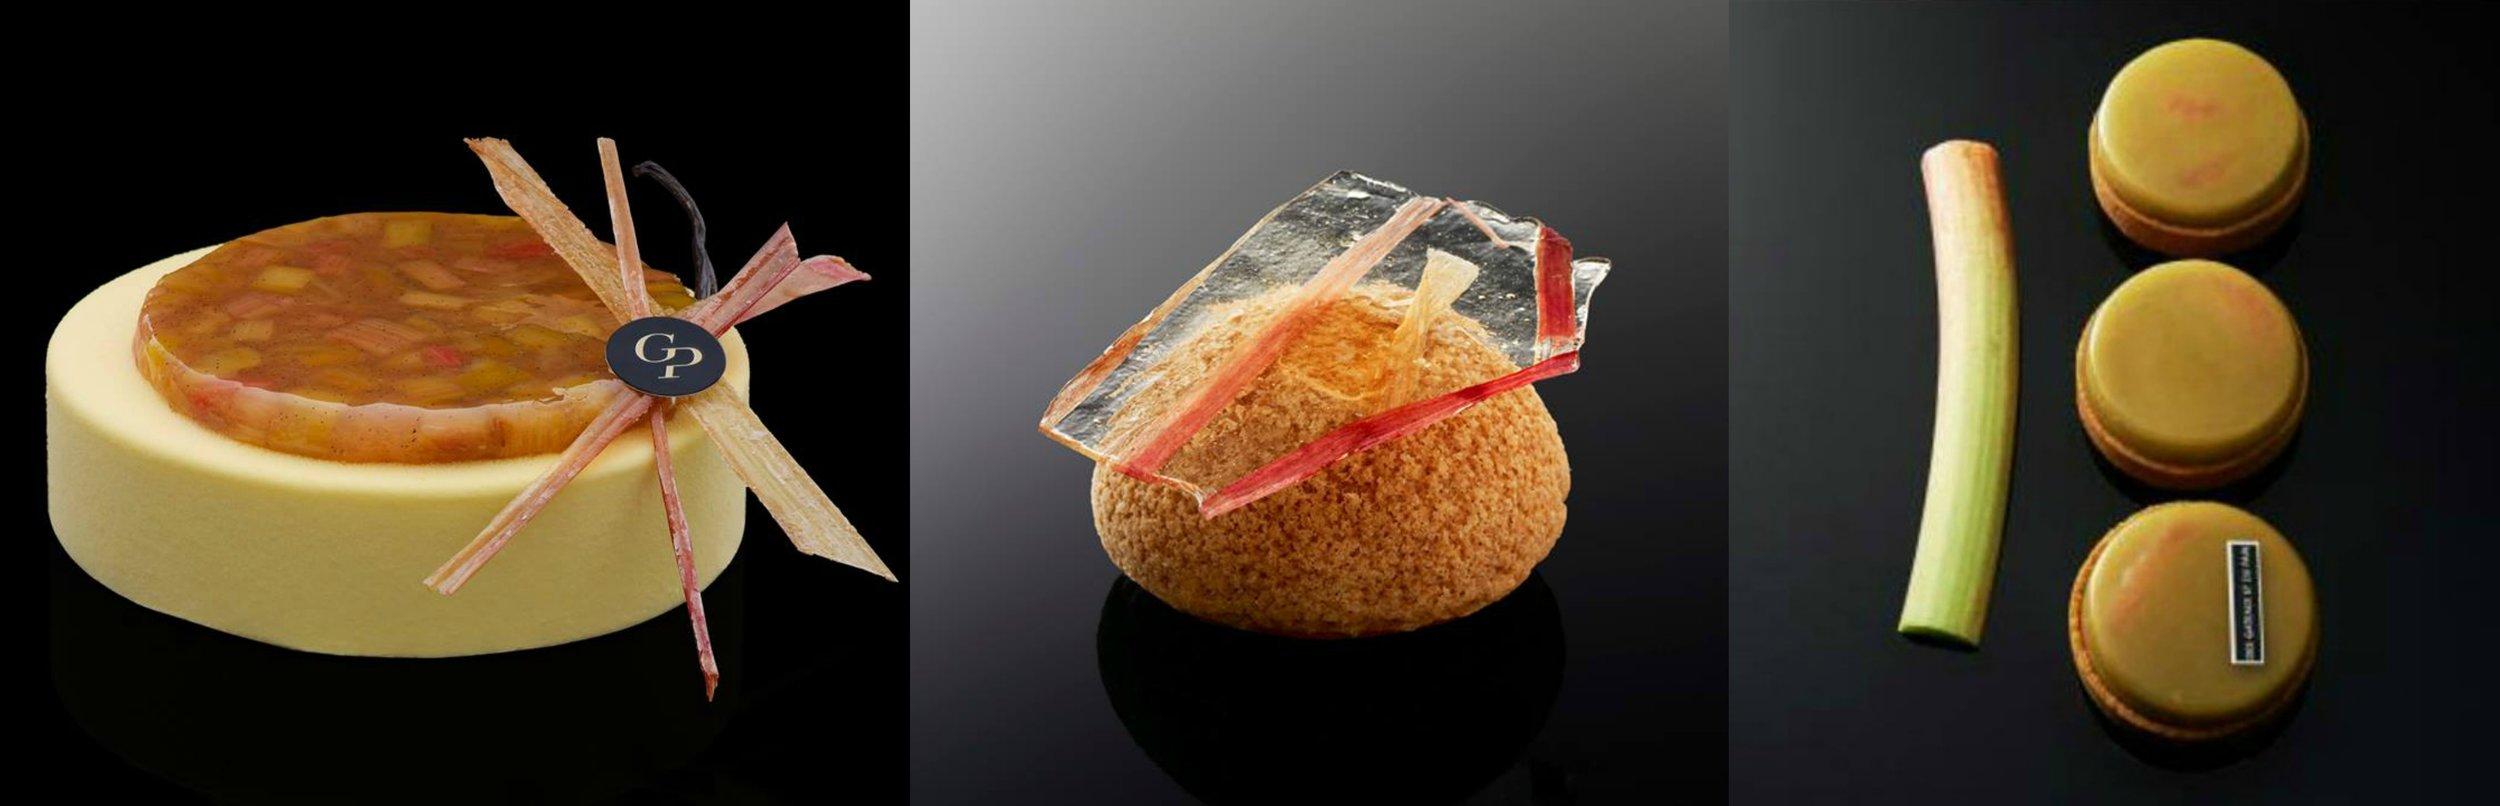 Claire Damon 以大黃為主題創作的甜點,由左至右分別為包括大黃蛋糕(Bâton de rhubarb)、 大黃泡芙(Chou rhubarb)大黃塔(Paradisi)。 Photo| @desgateauxetdupaincom ,Facebook